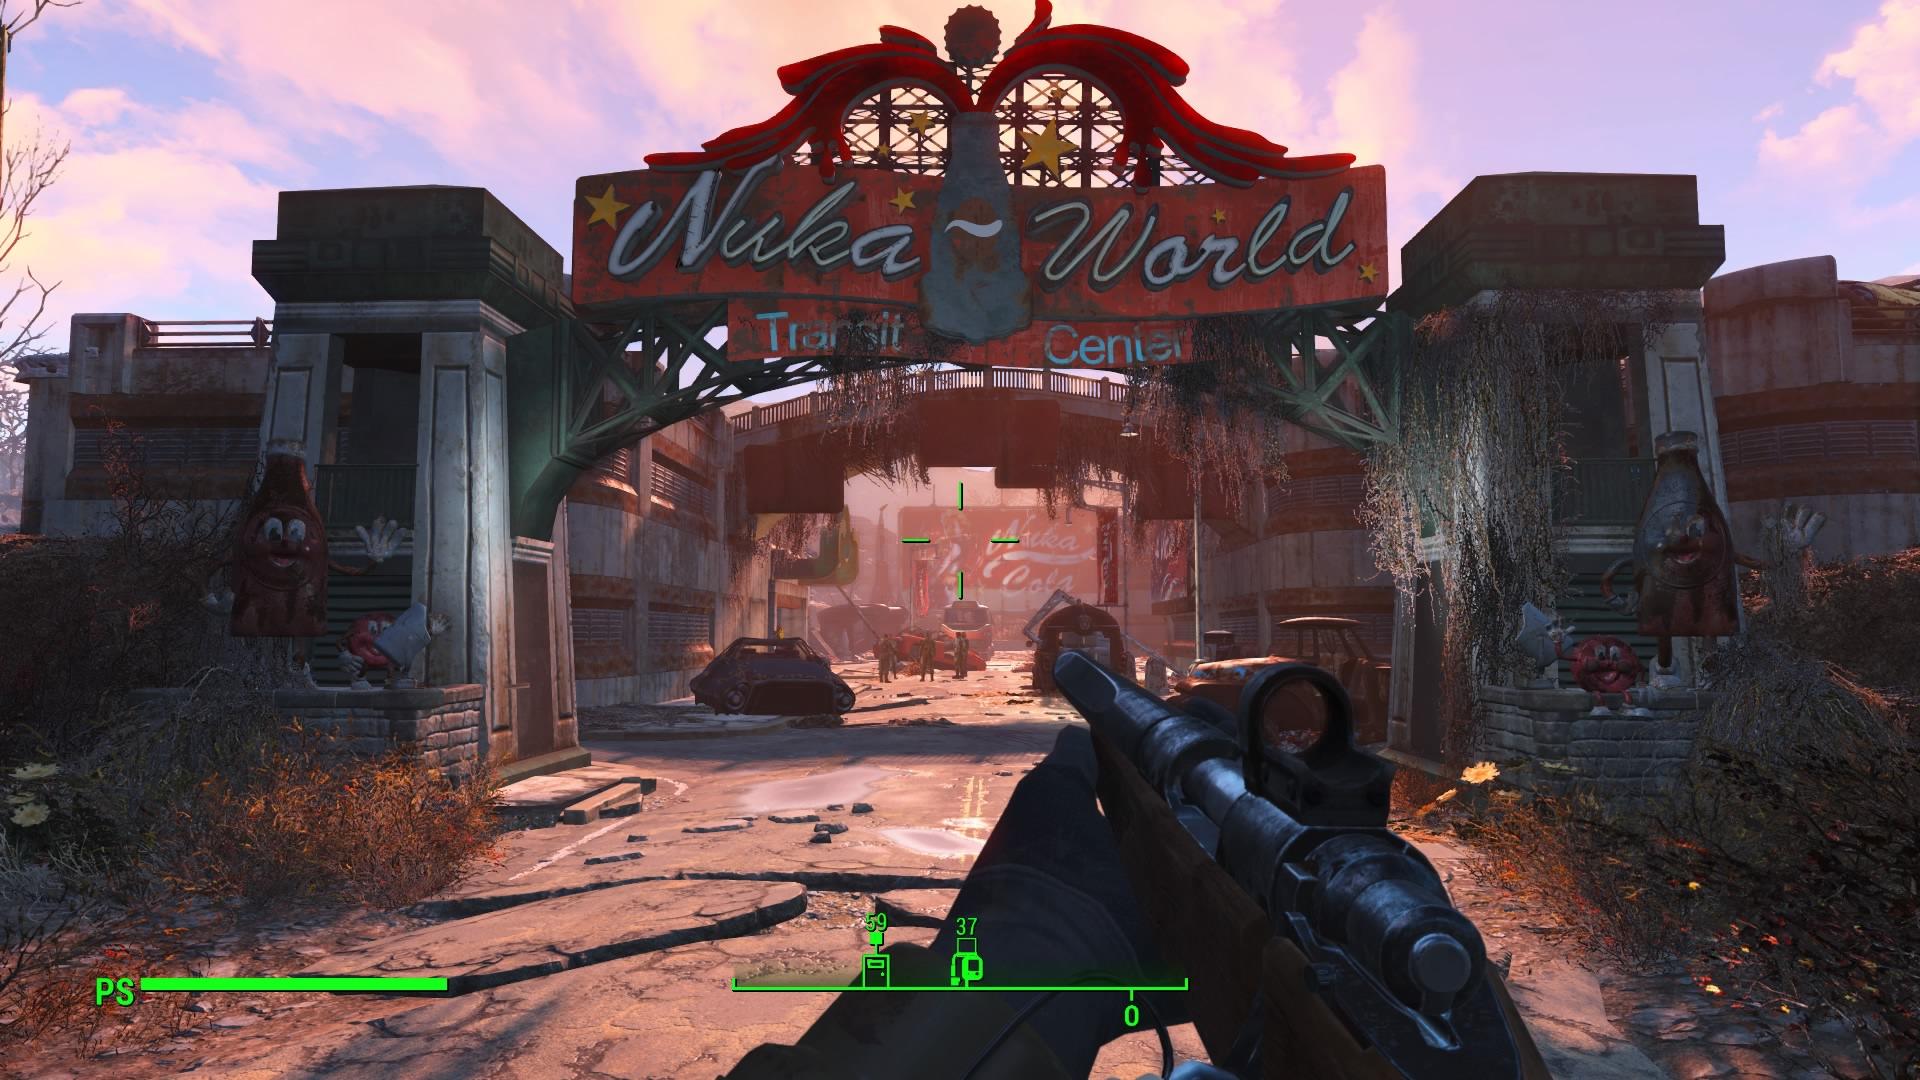 Fallout 4 Nuka World Enter